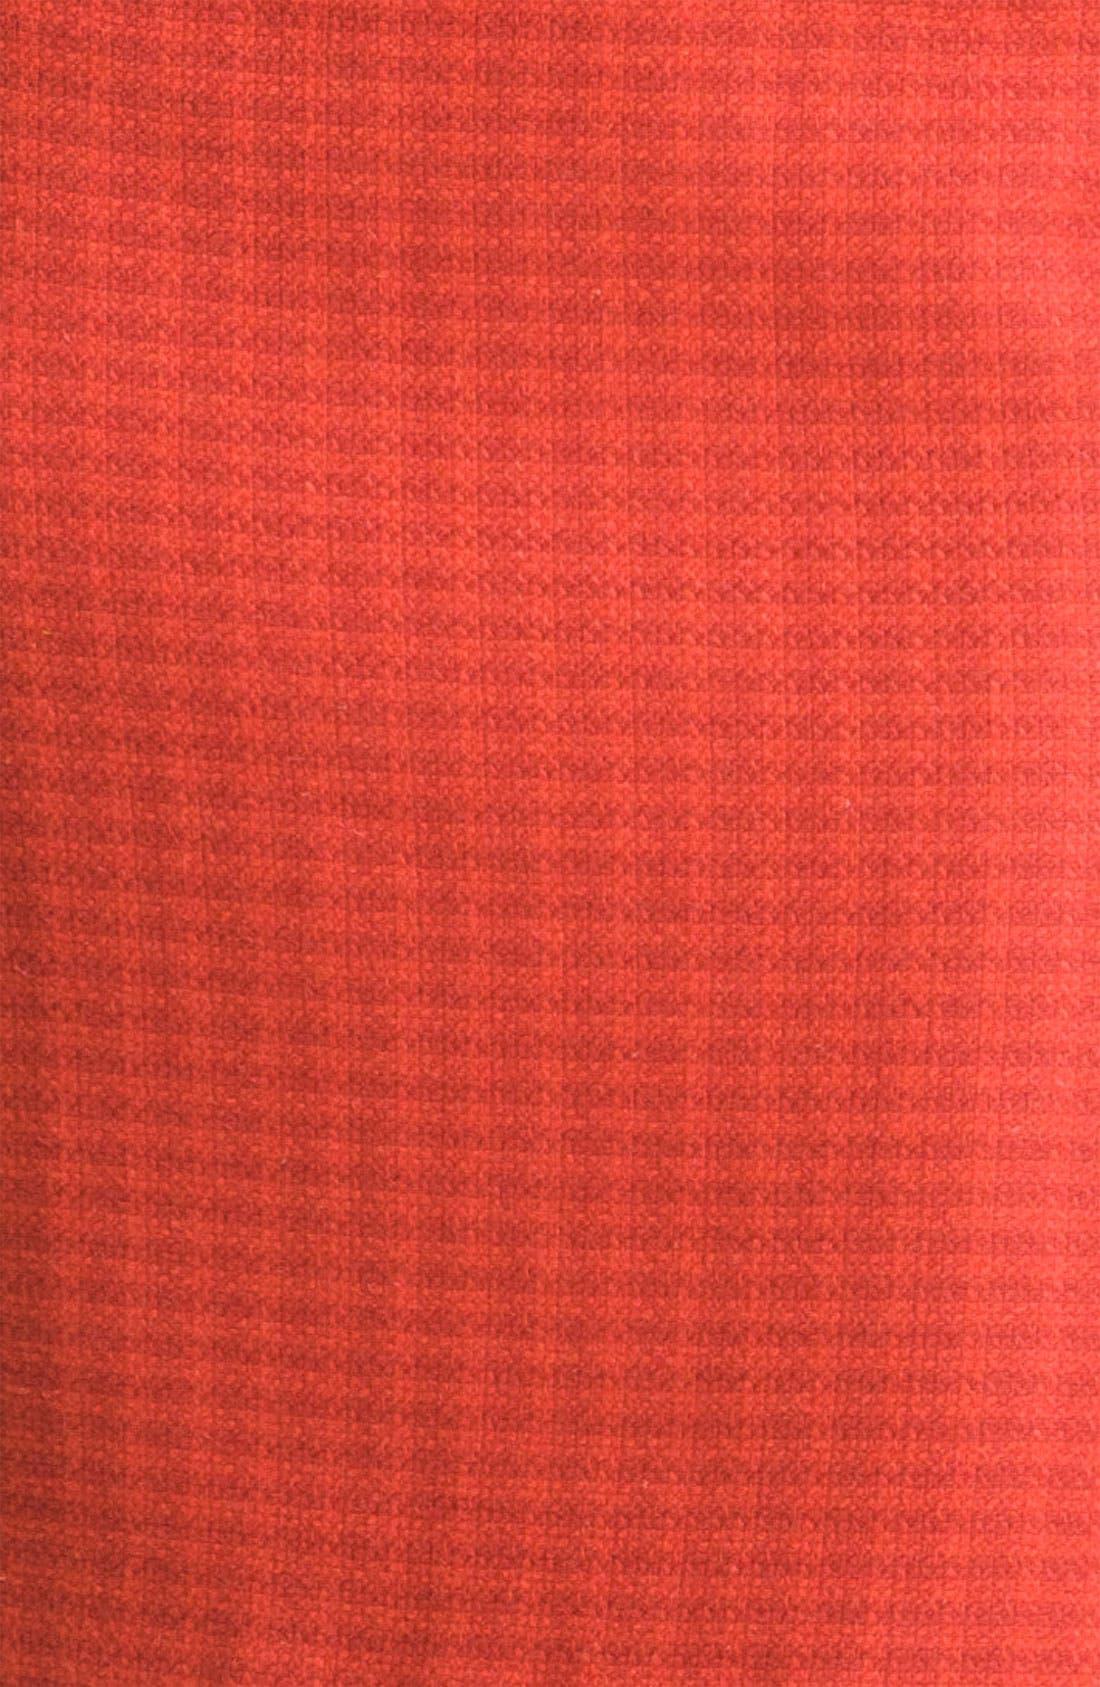 Alternate Image 3  - Tory Burch 'Cornelia' Skirt